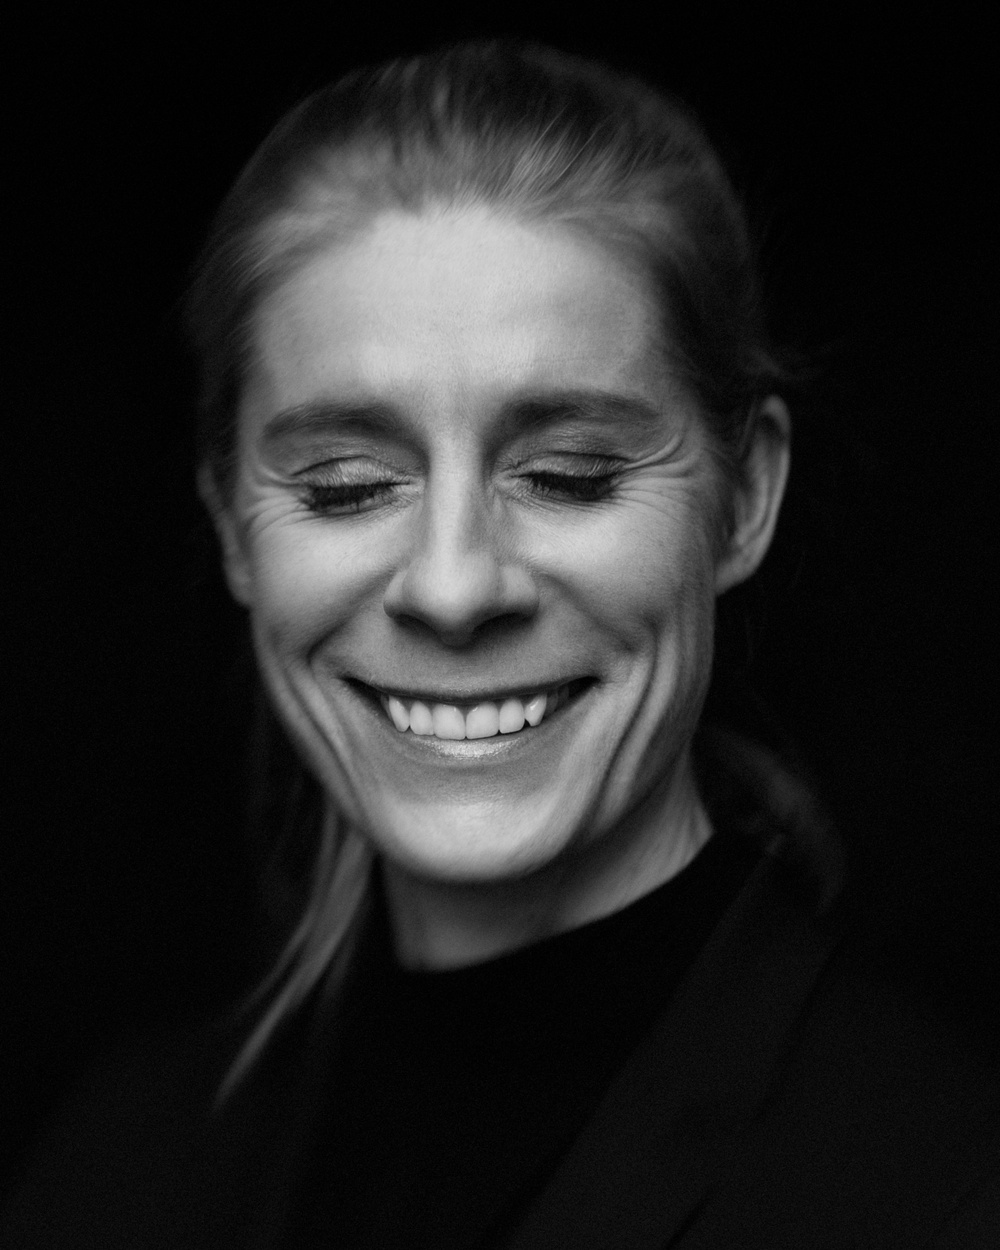 Fotograf: Jonas Koel